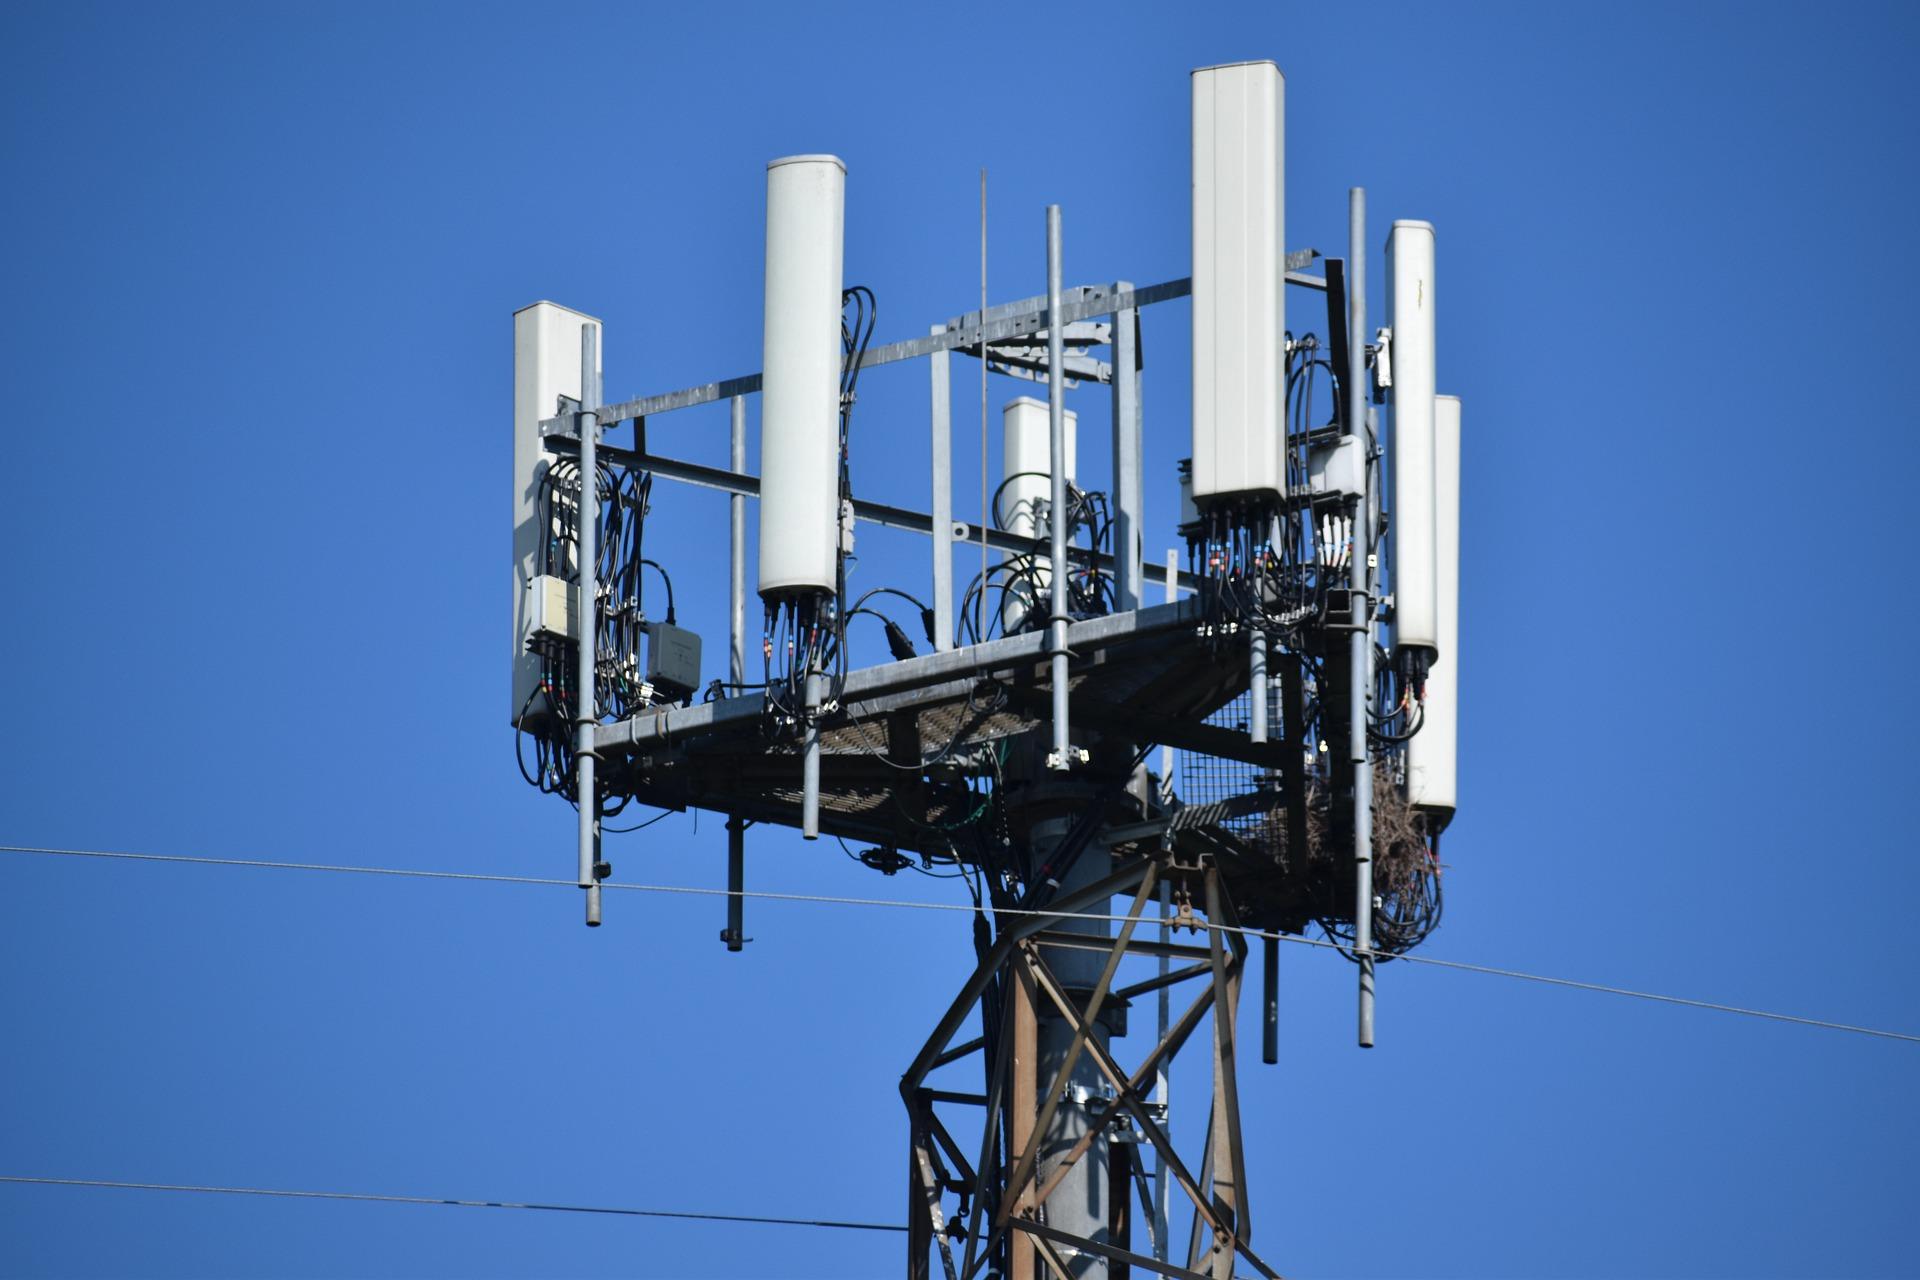 Una torre de telecomunicaciones